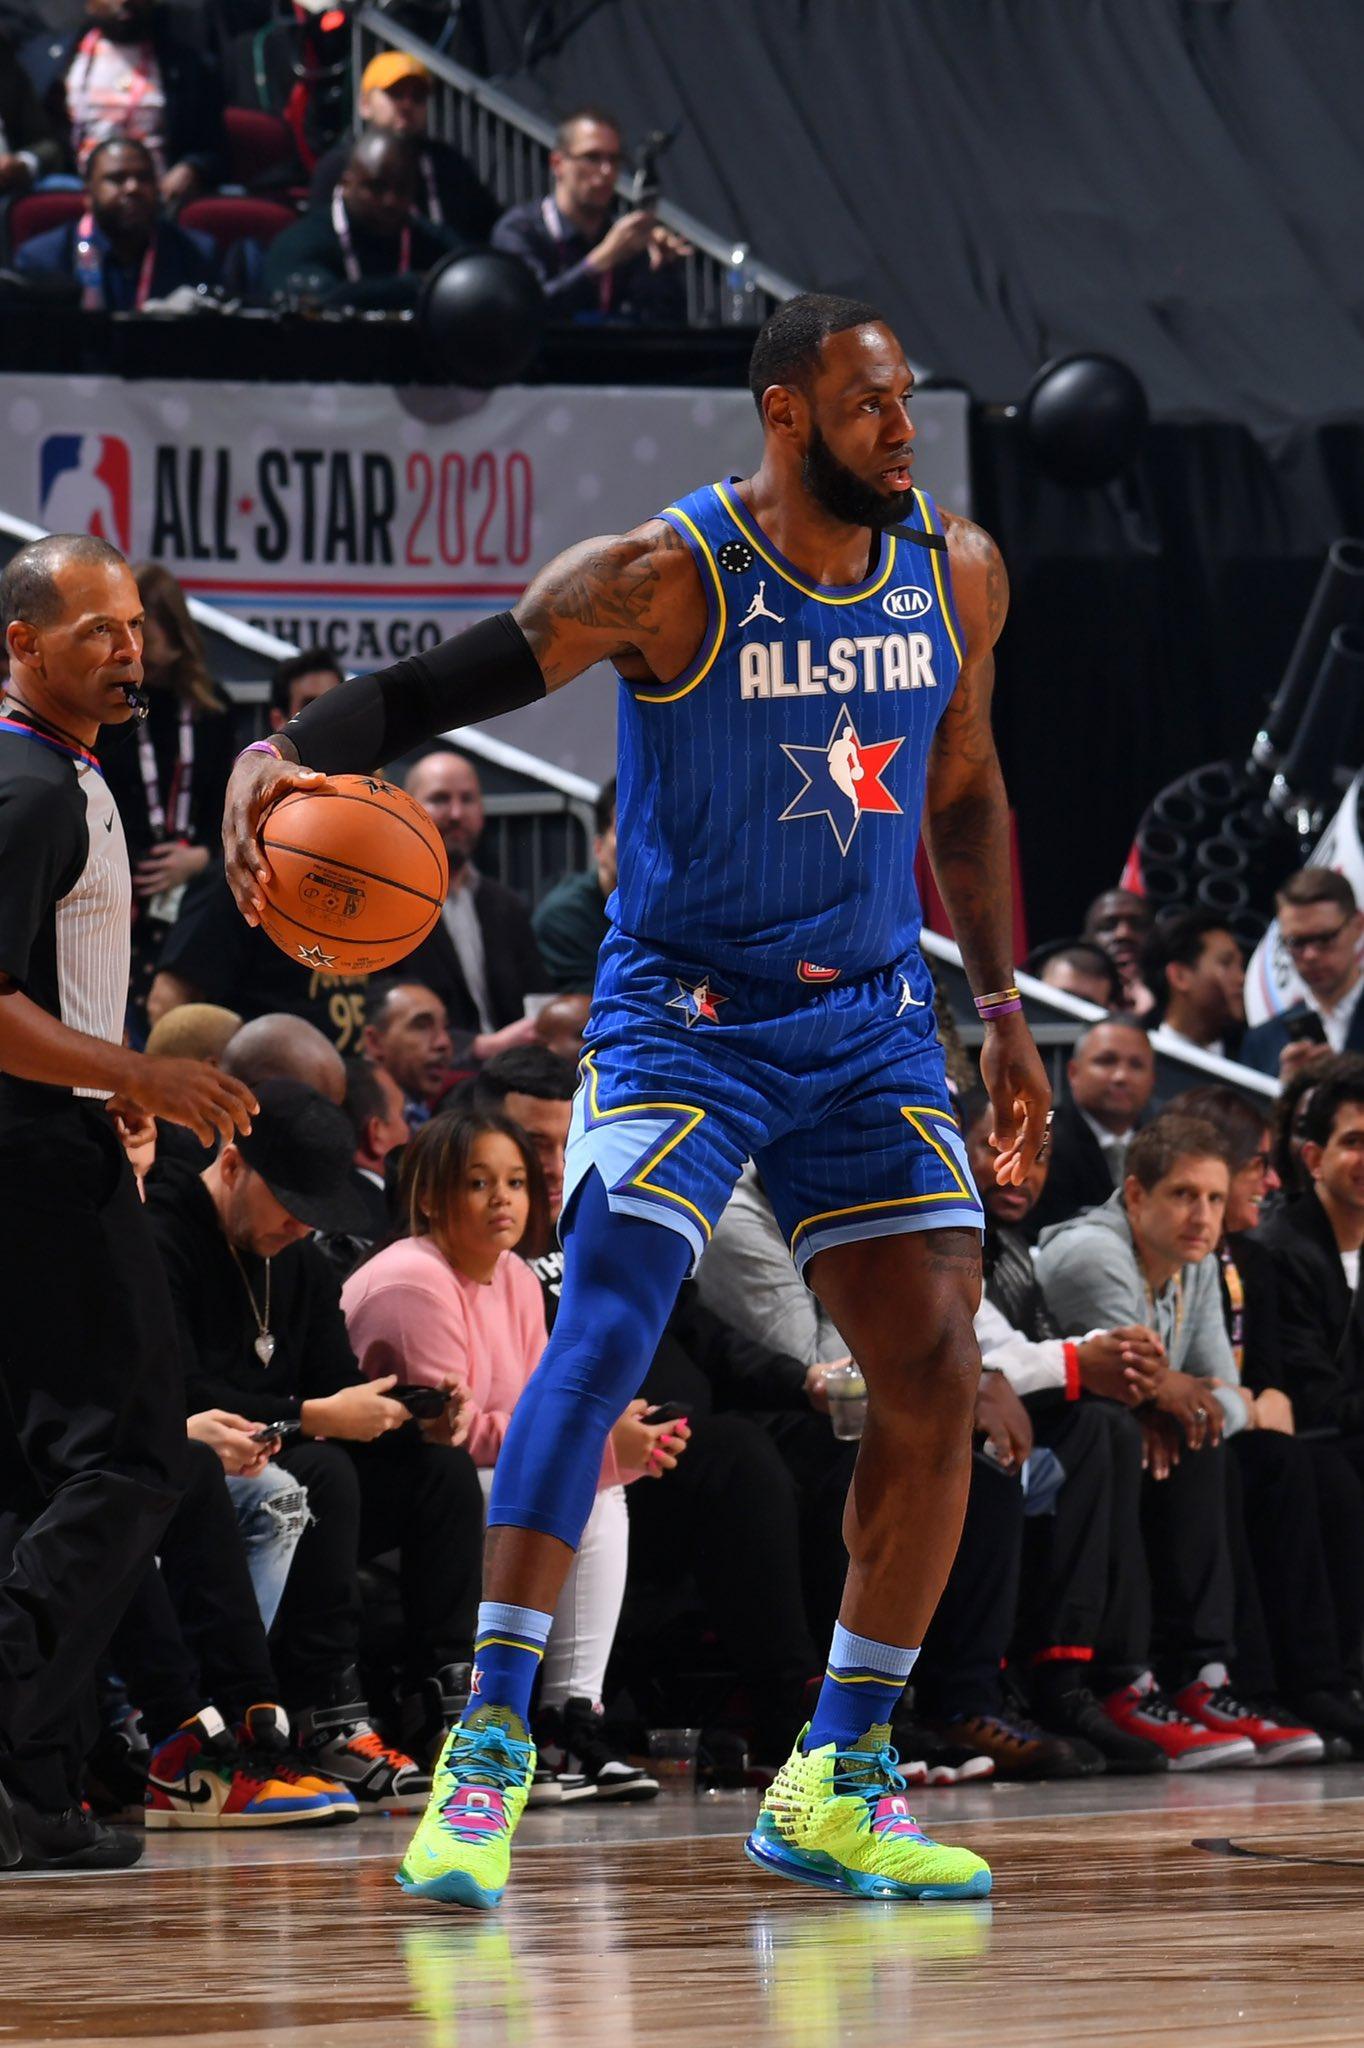 NBA All-Star 2020 Wallpapers - Wallpaper Cave